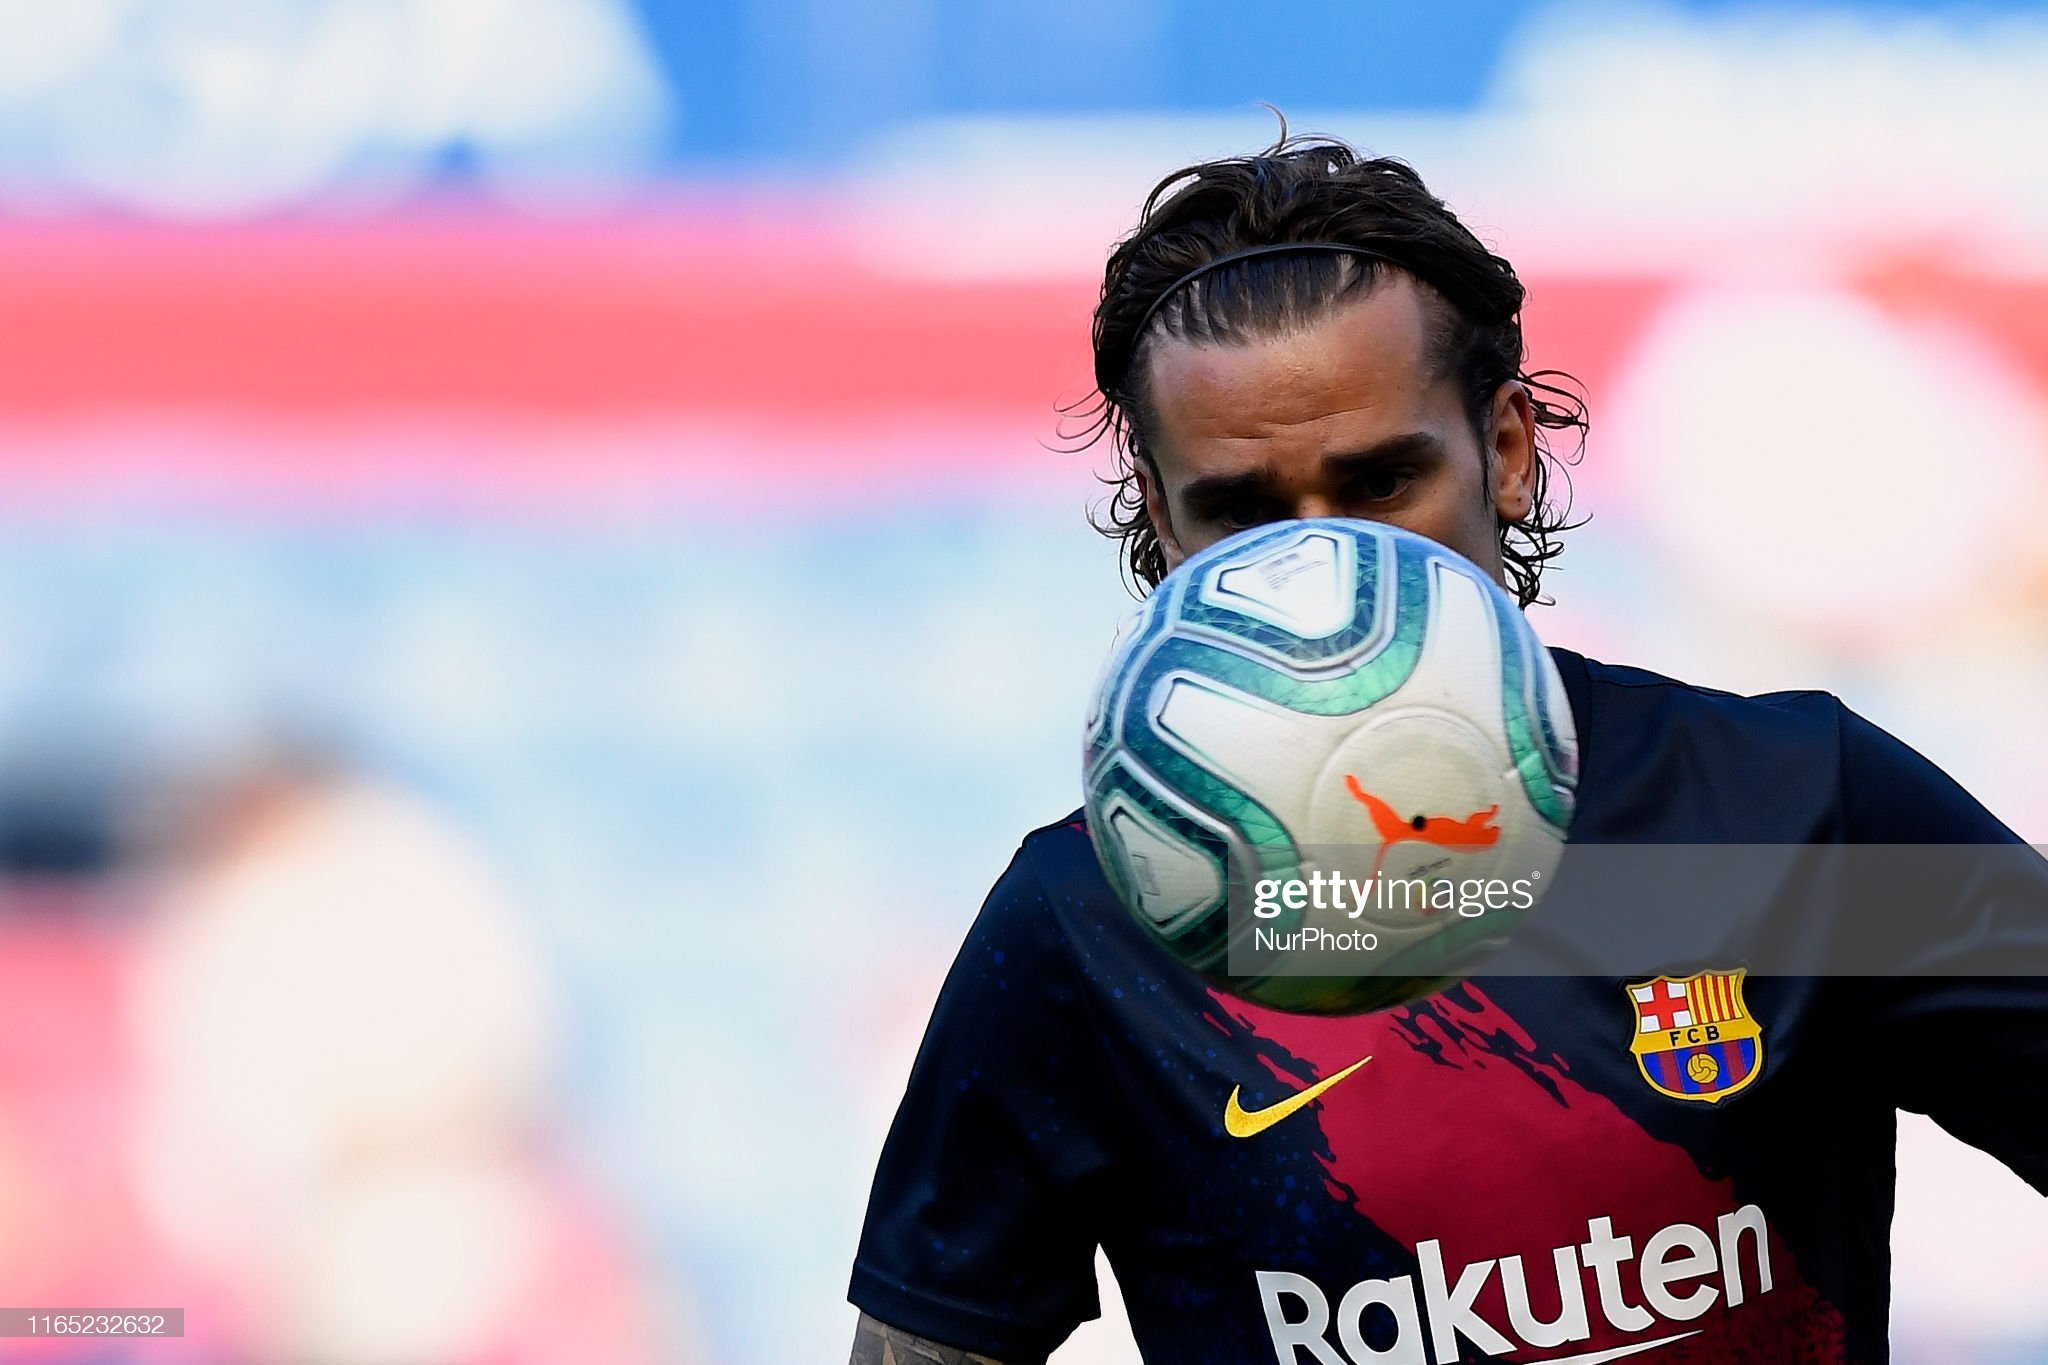 صور مباراة : أوساسونا - برشلونة 2-2 ( 31-08-2019 )  Antoine-griezmann-of-barcelona-during-the-warmup-before-the-liga-ca-picture-id1165232632?s=2048x2048